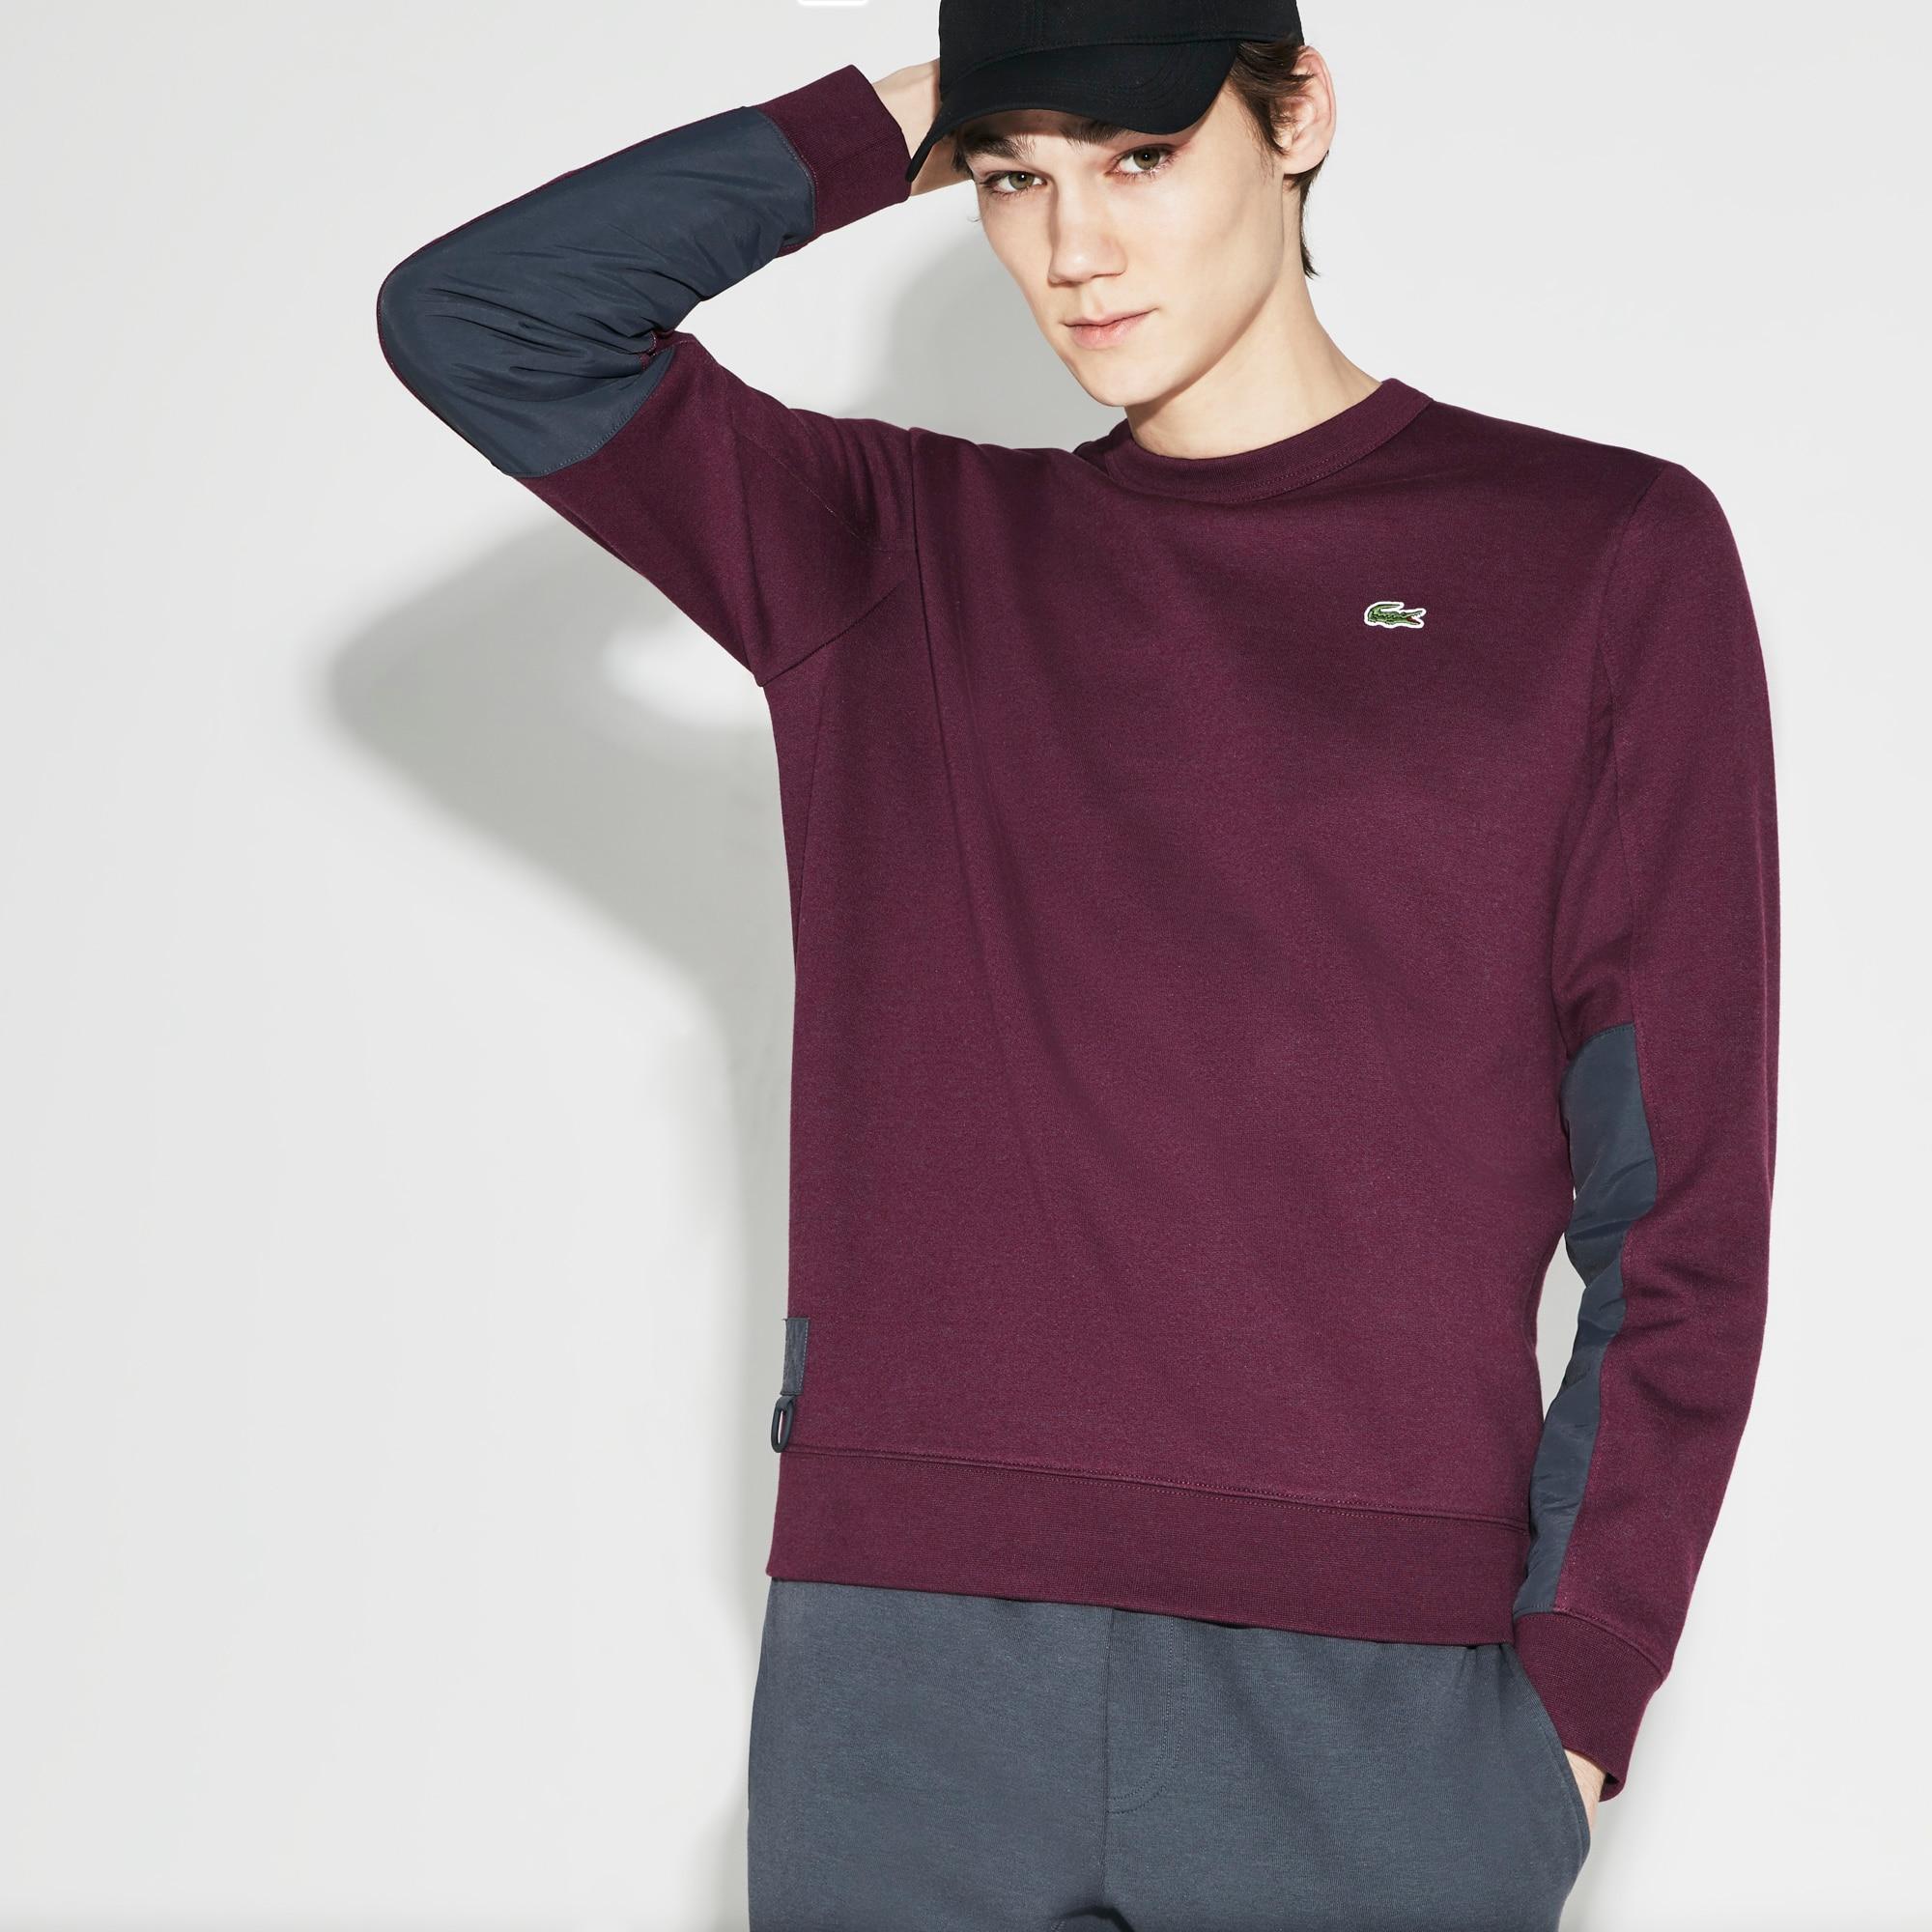 Lacoste SPORT系列男士防水拉绒网球运动衫